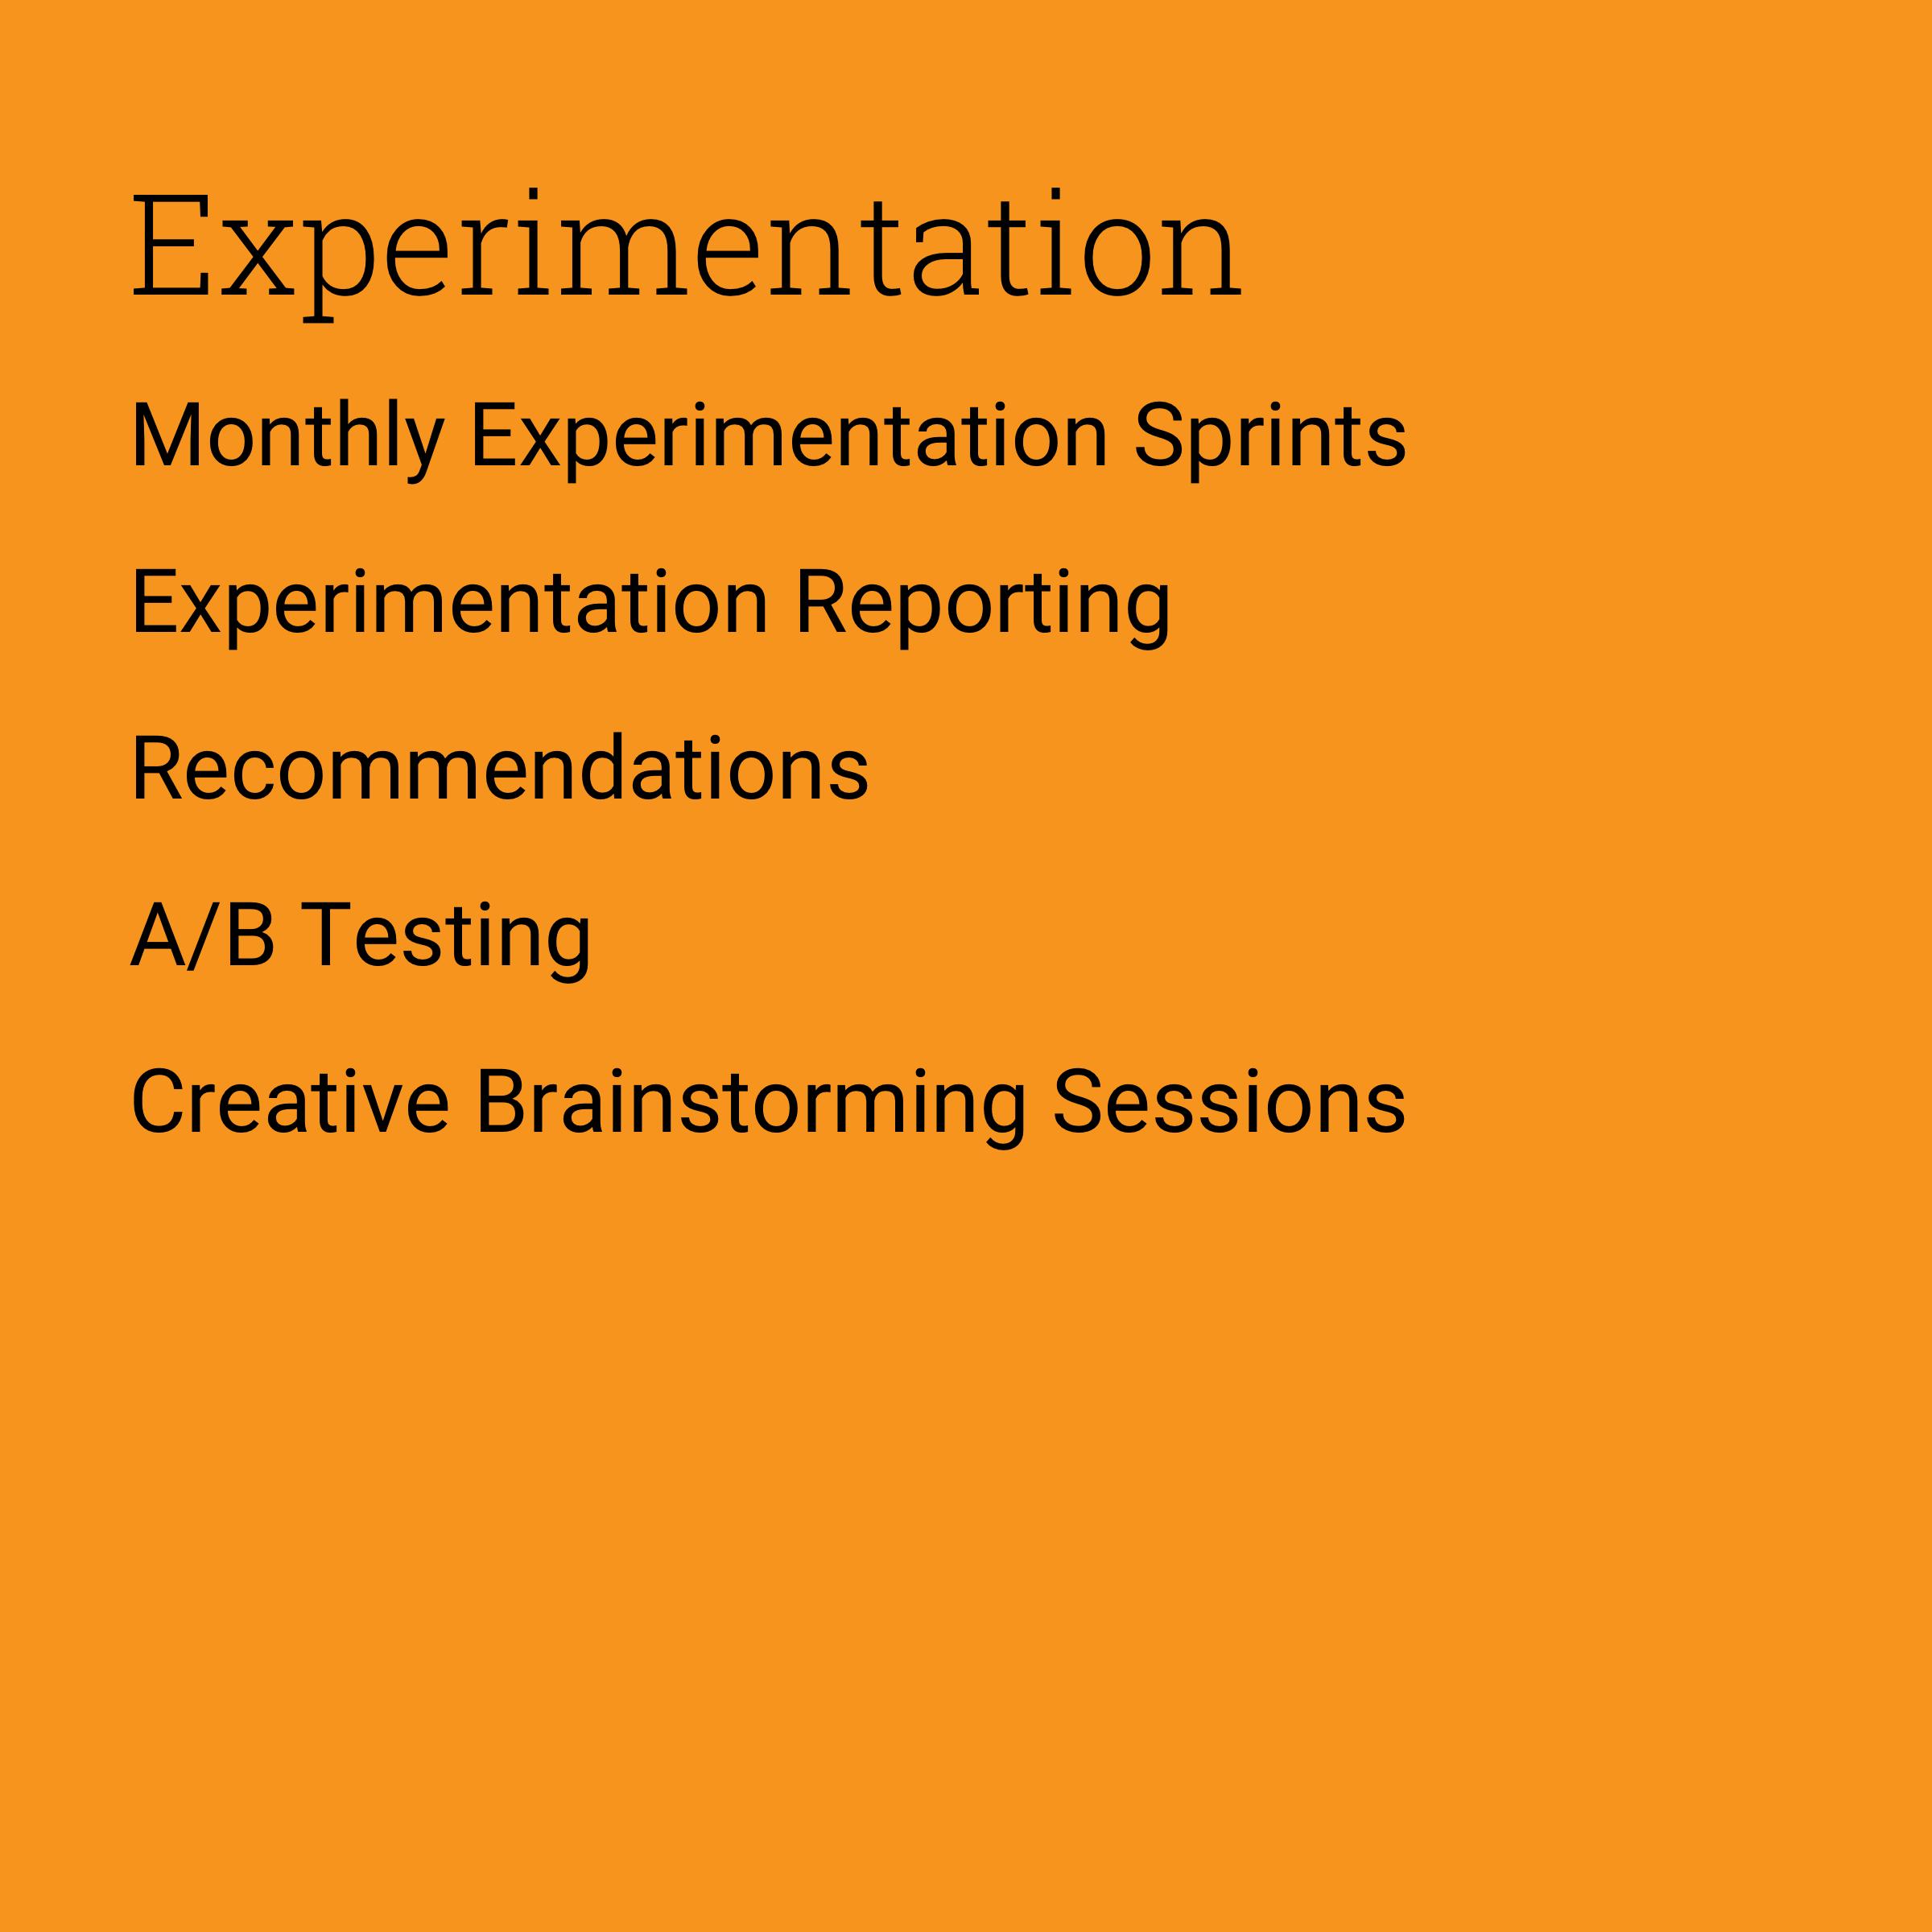 Experimentation.png